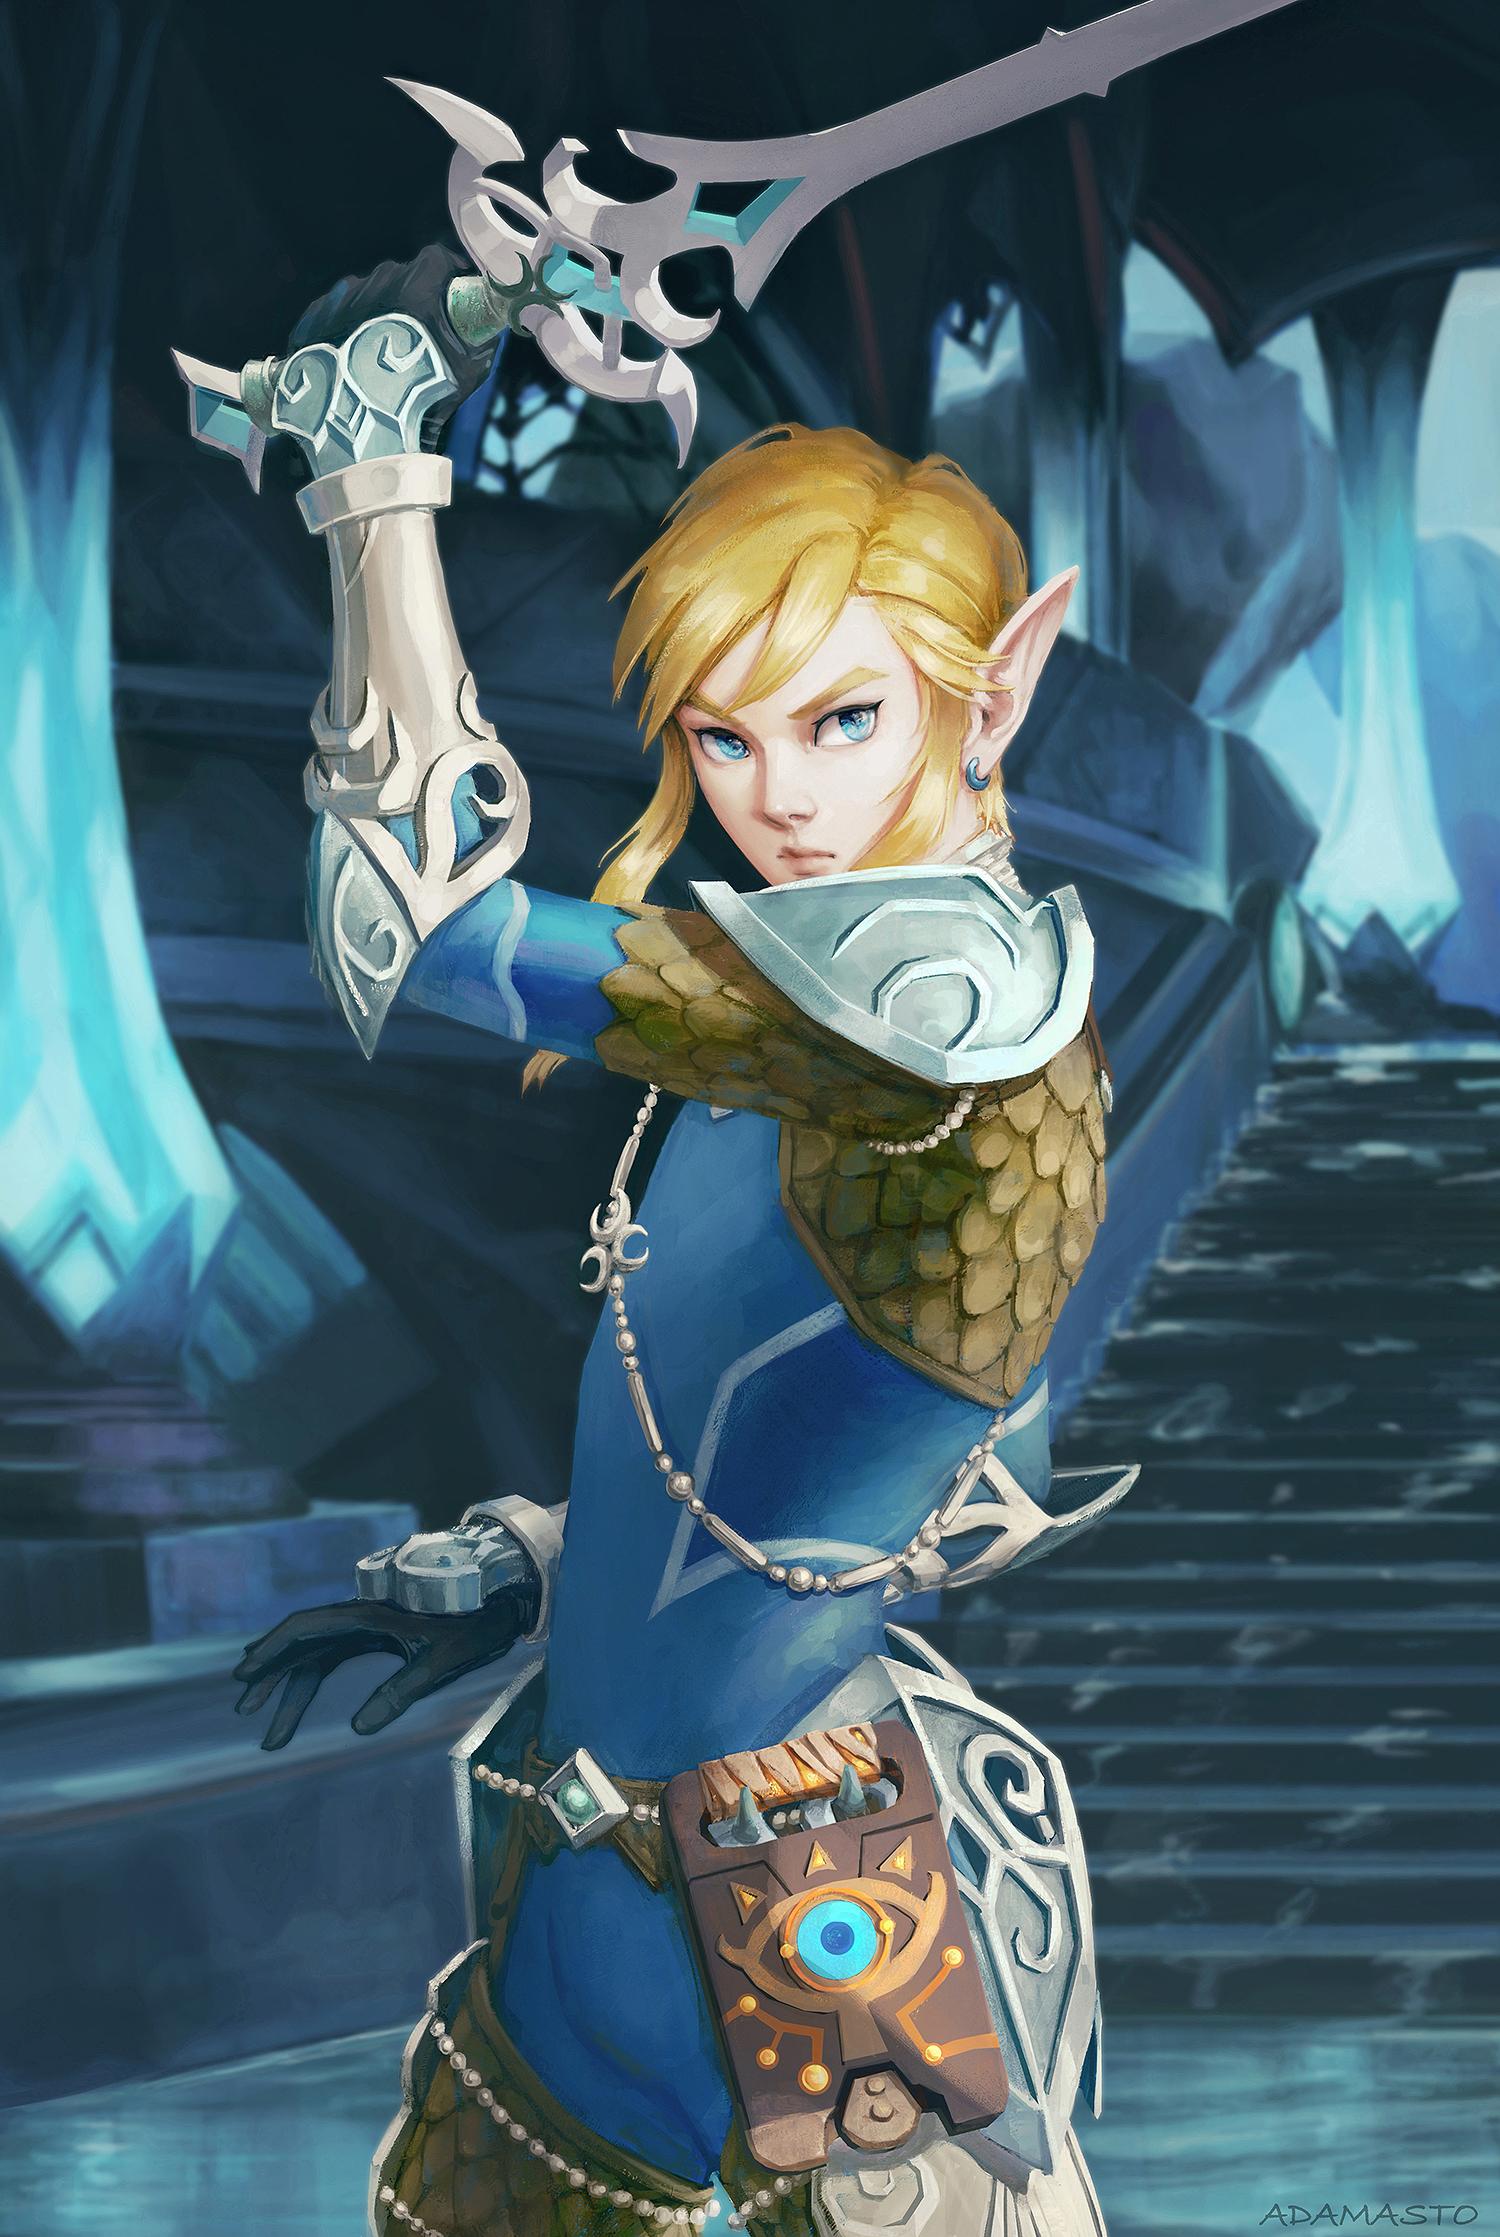 Link The Legend Of Zelda Breath Of The Wild By Adamasto